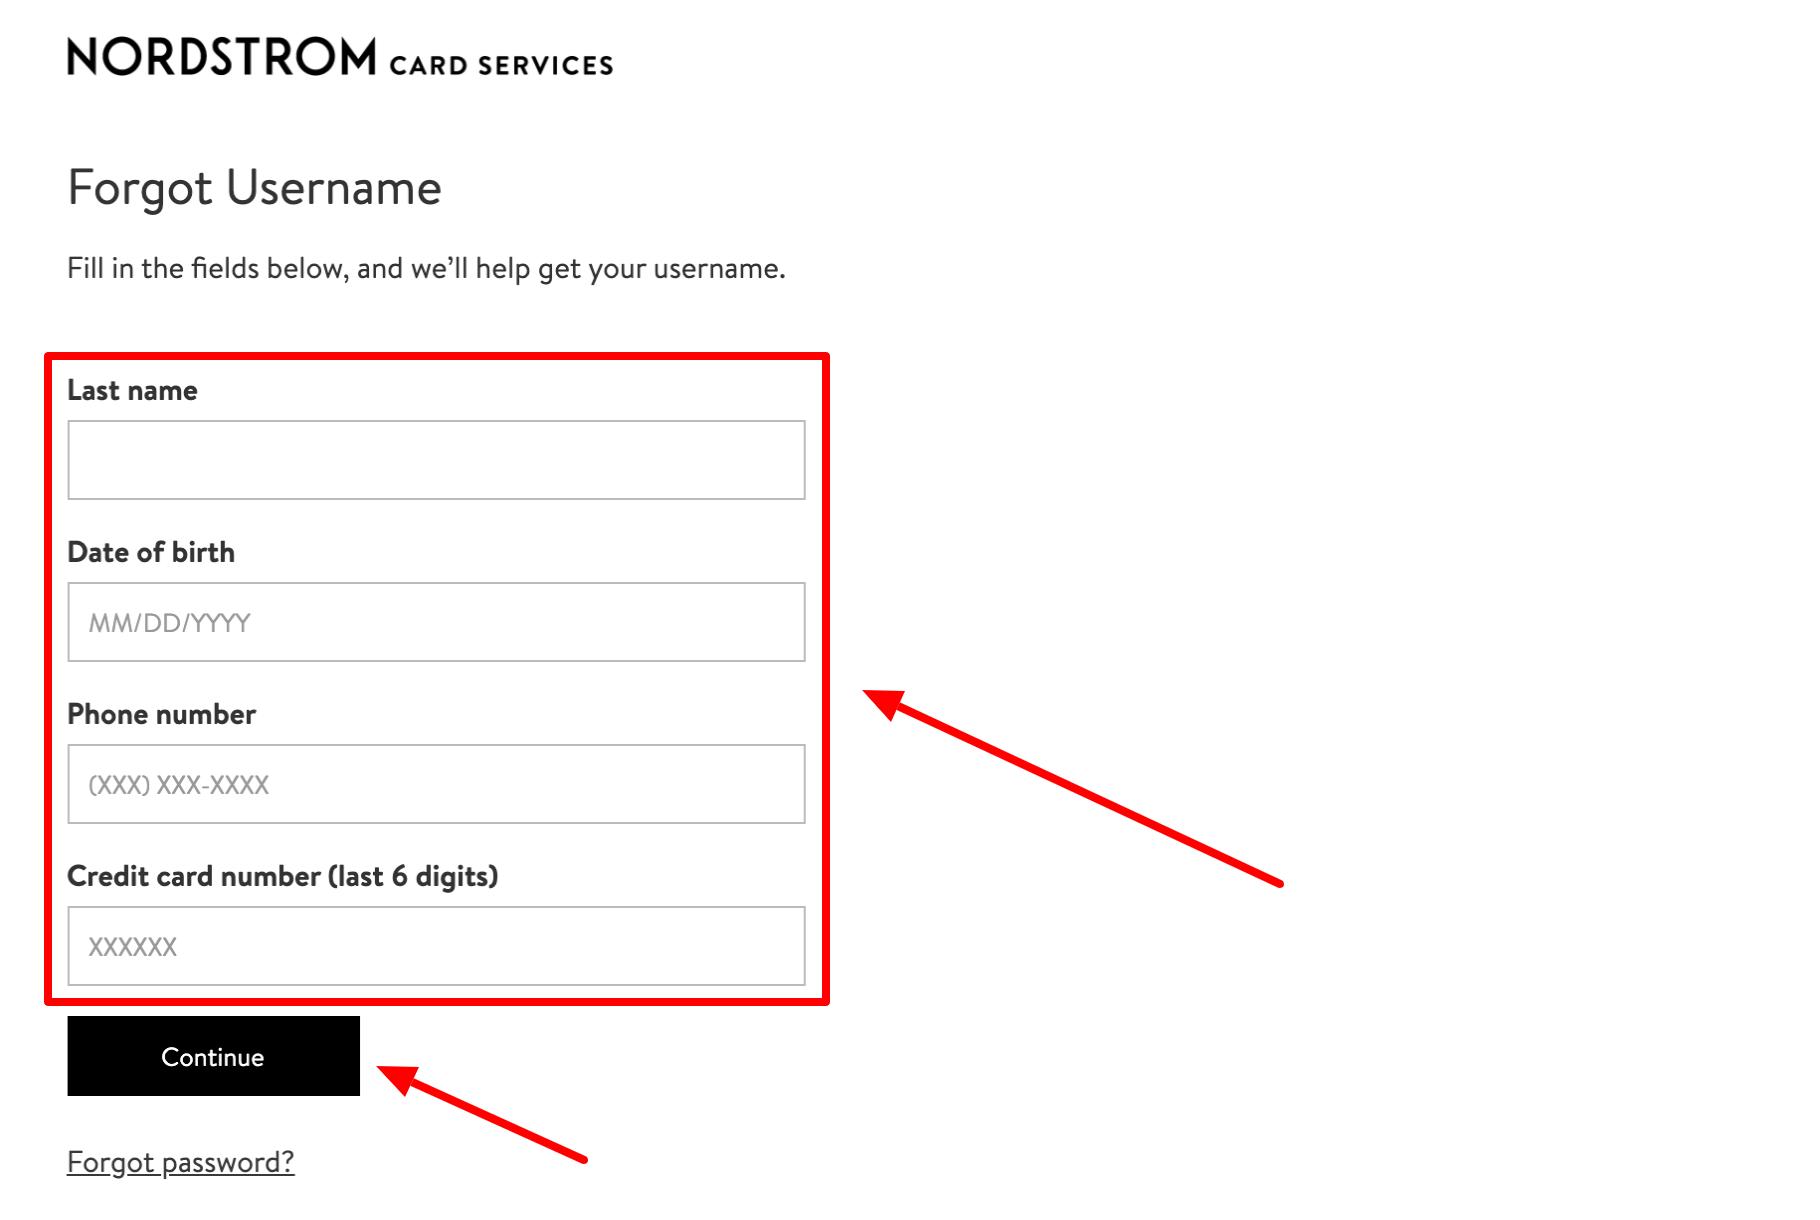 Nordstrom Card Services Forgot Username